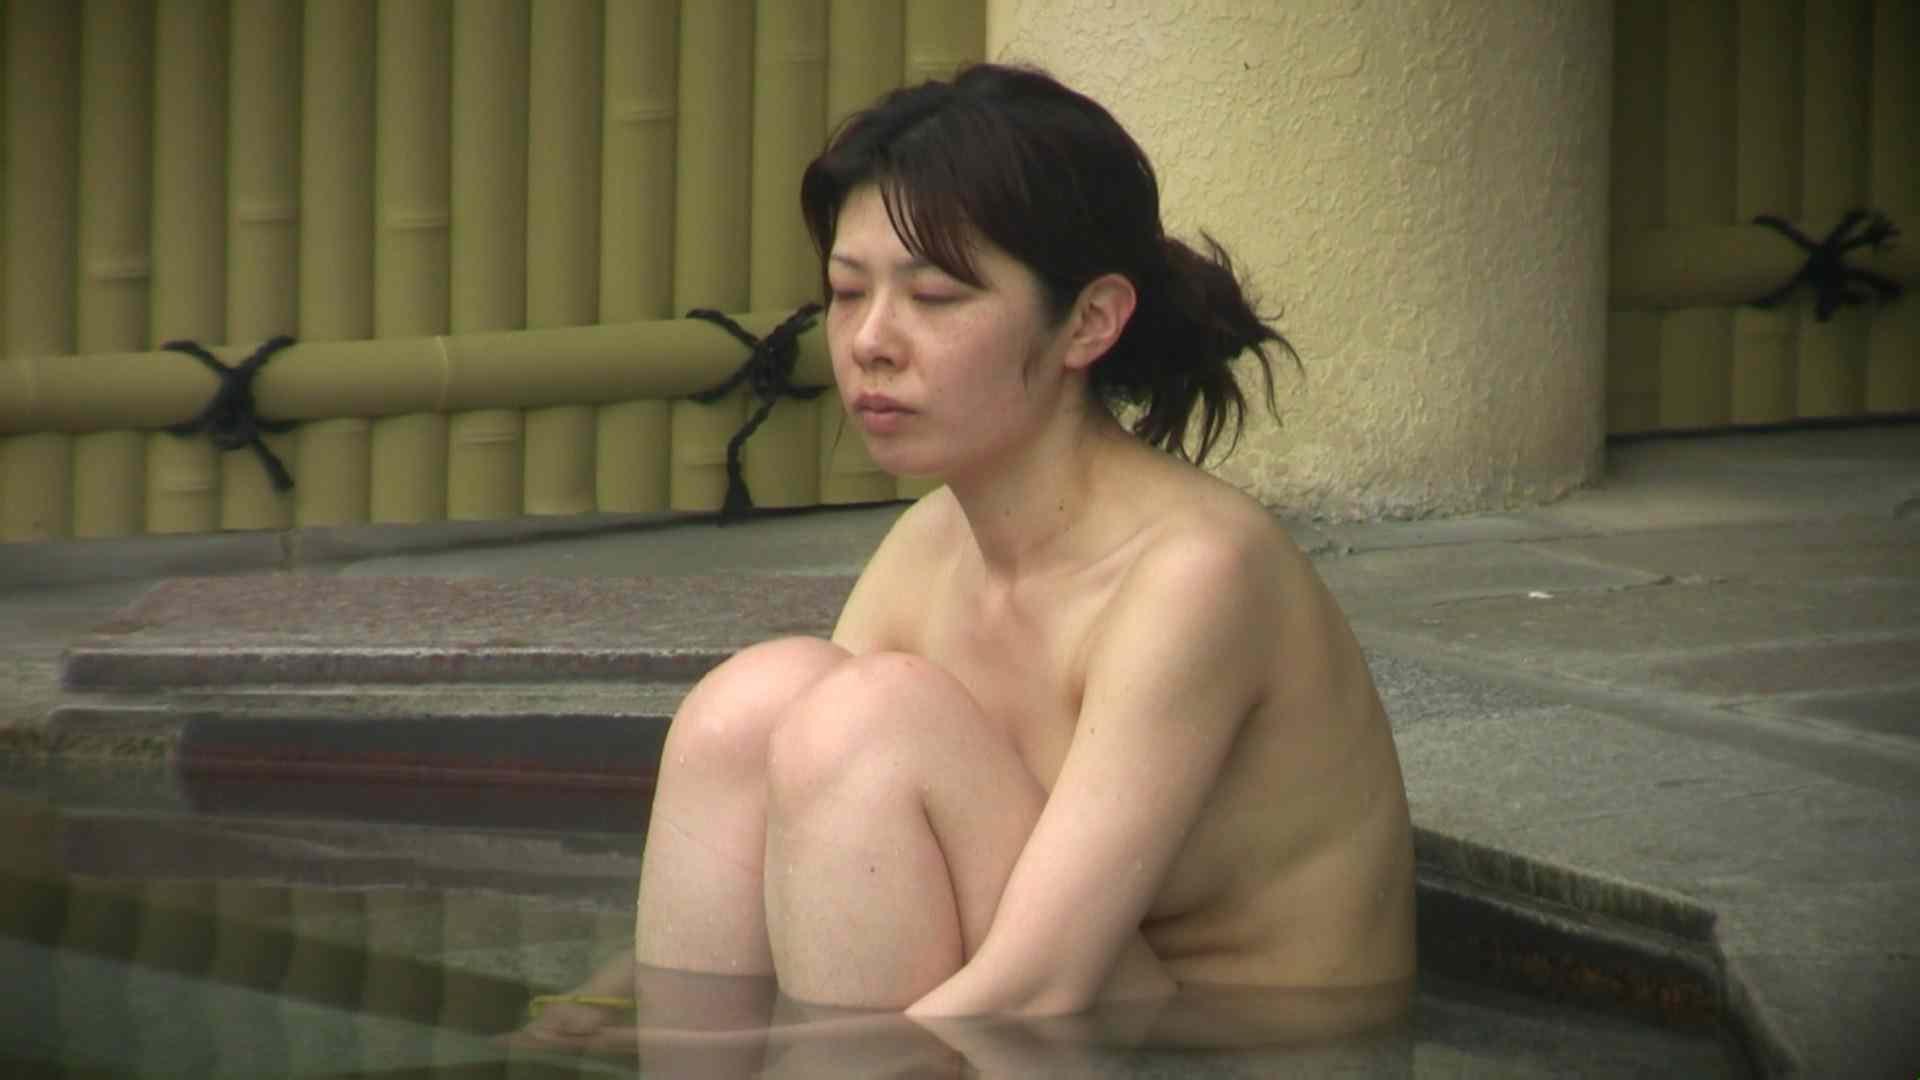 Aquaな露天風呂Vol.676 盗撮シリーズ | 露天風呂編  83PIX 53